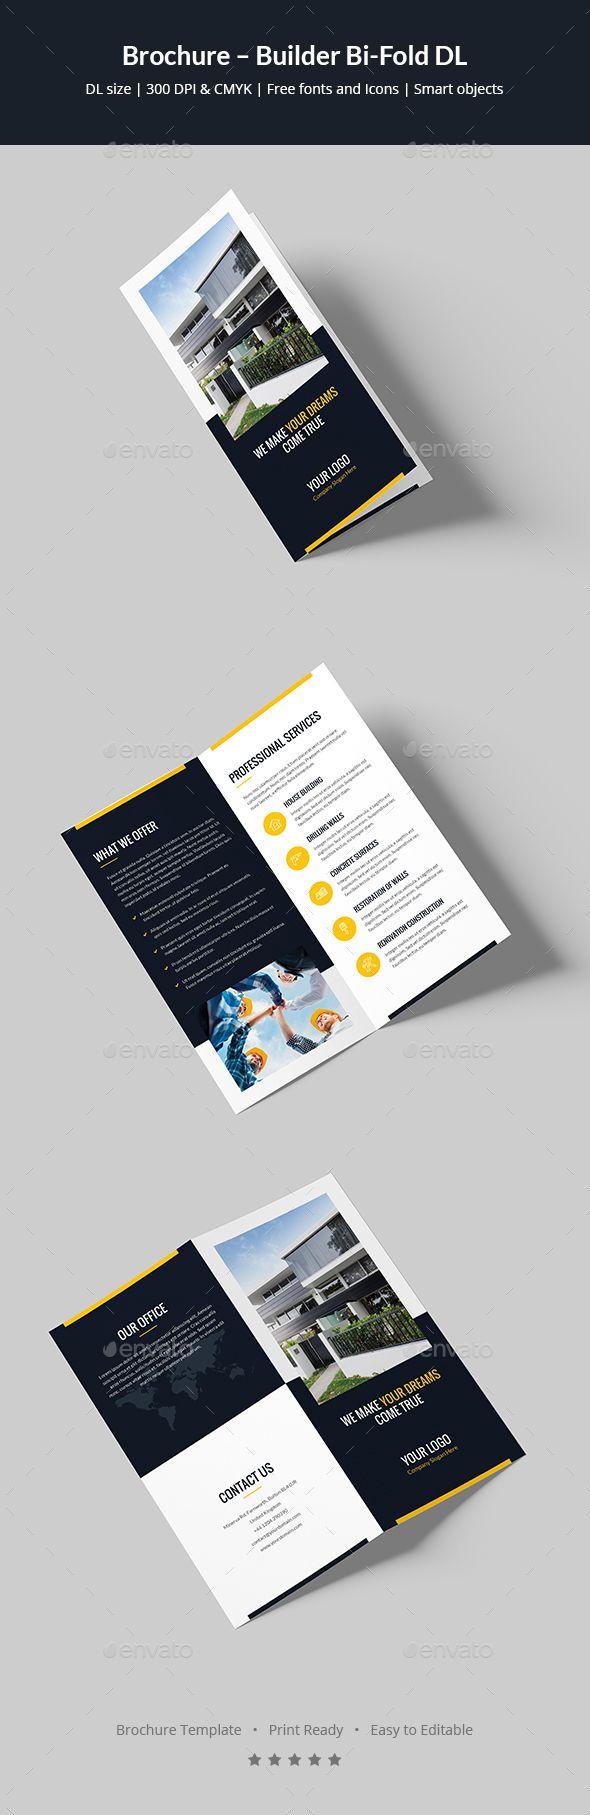 Builder Bi-Fold DL Brochure Template PSD